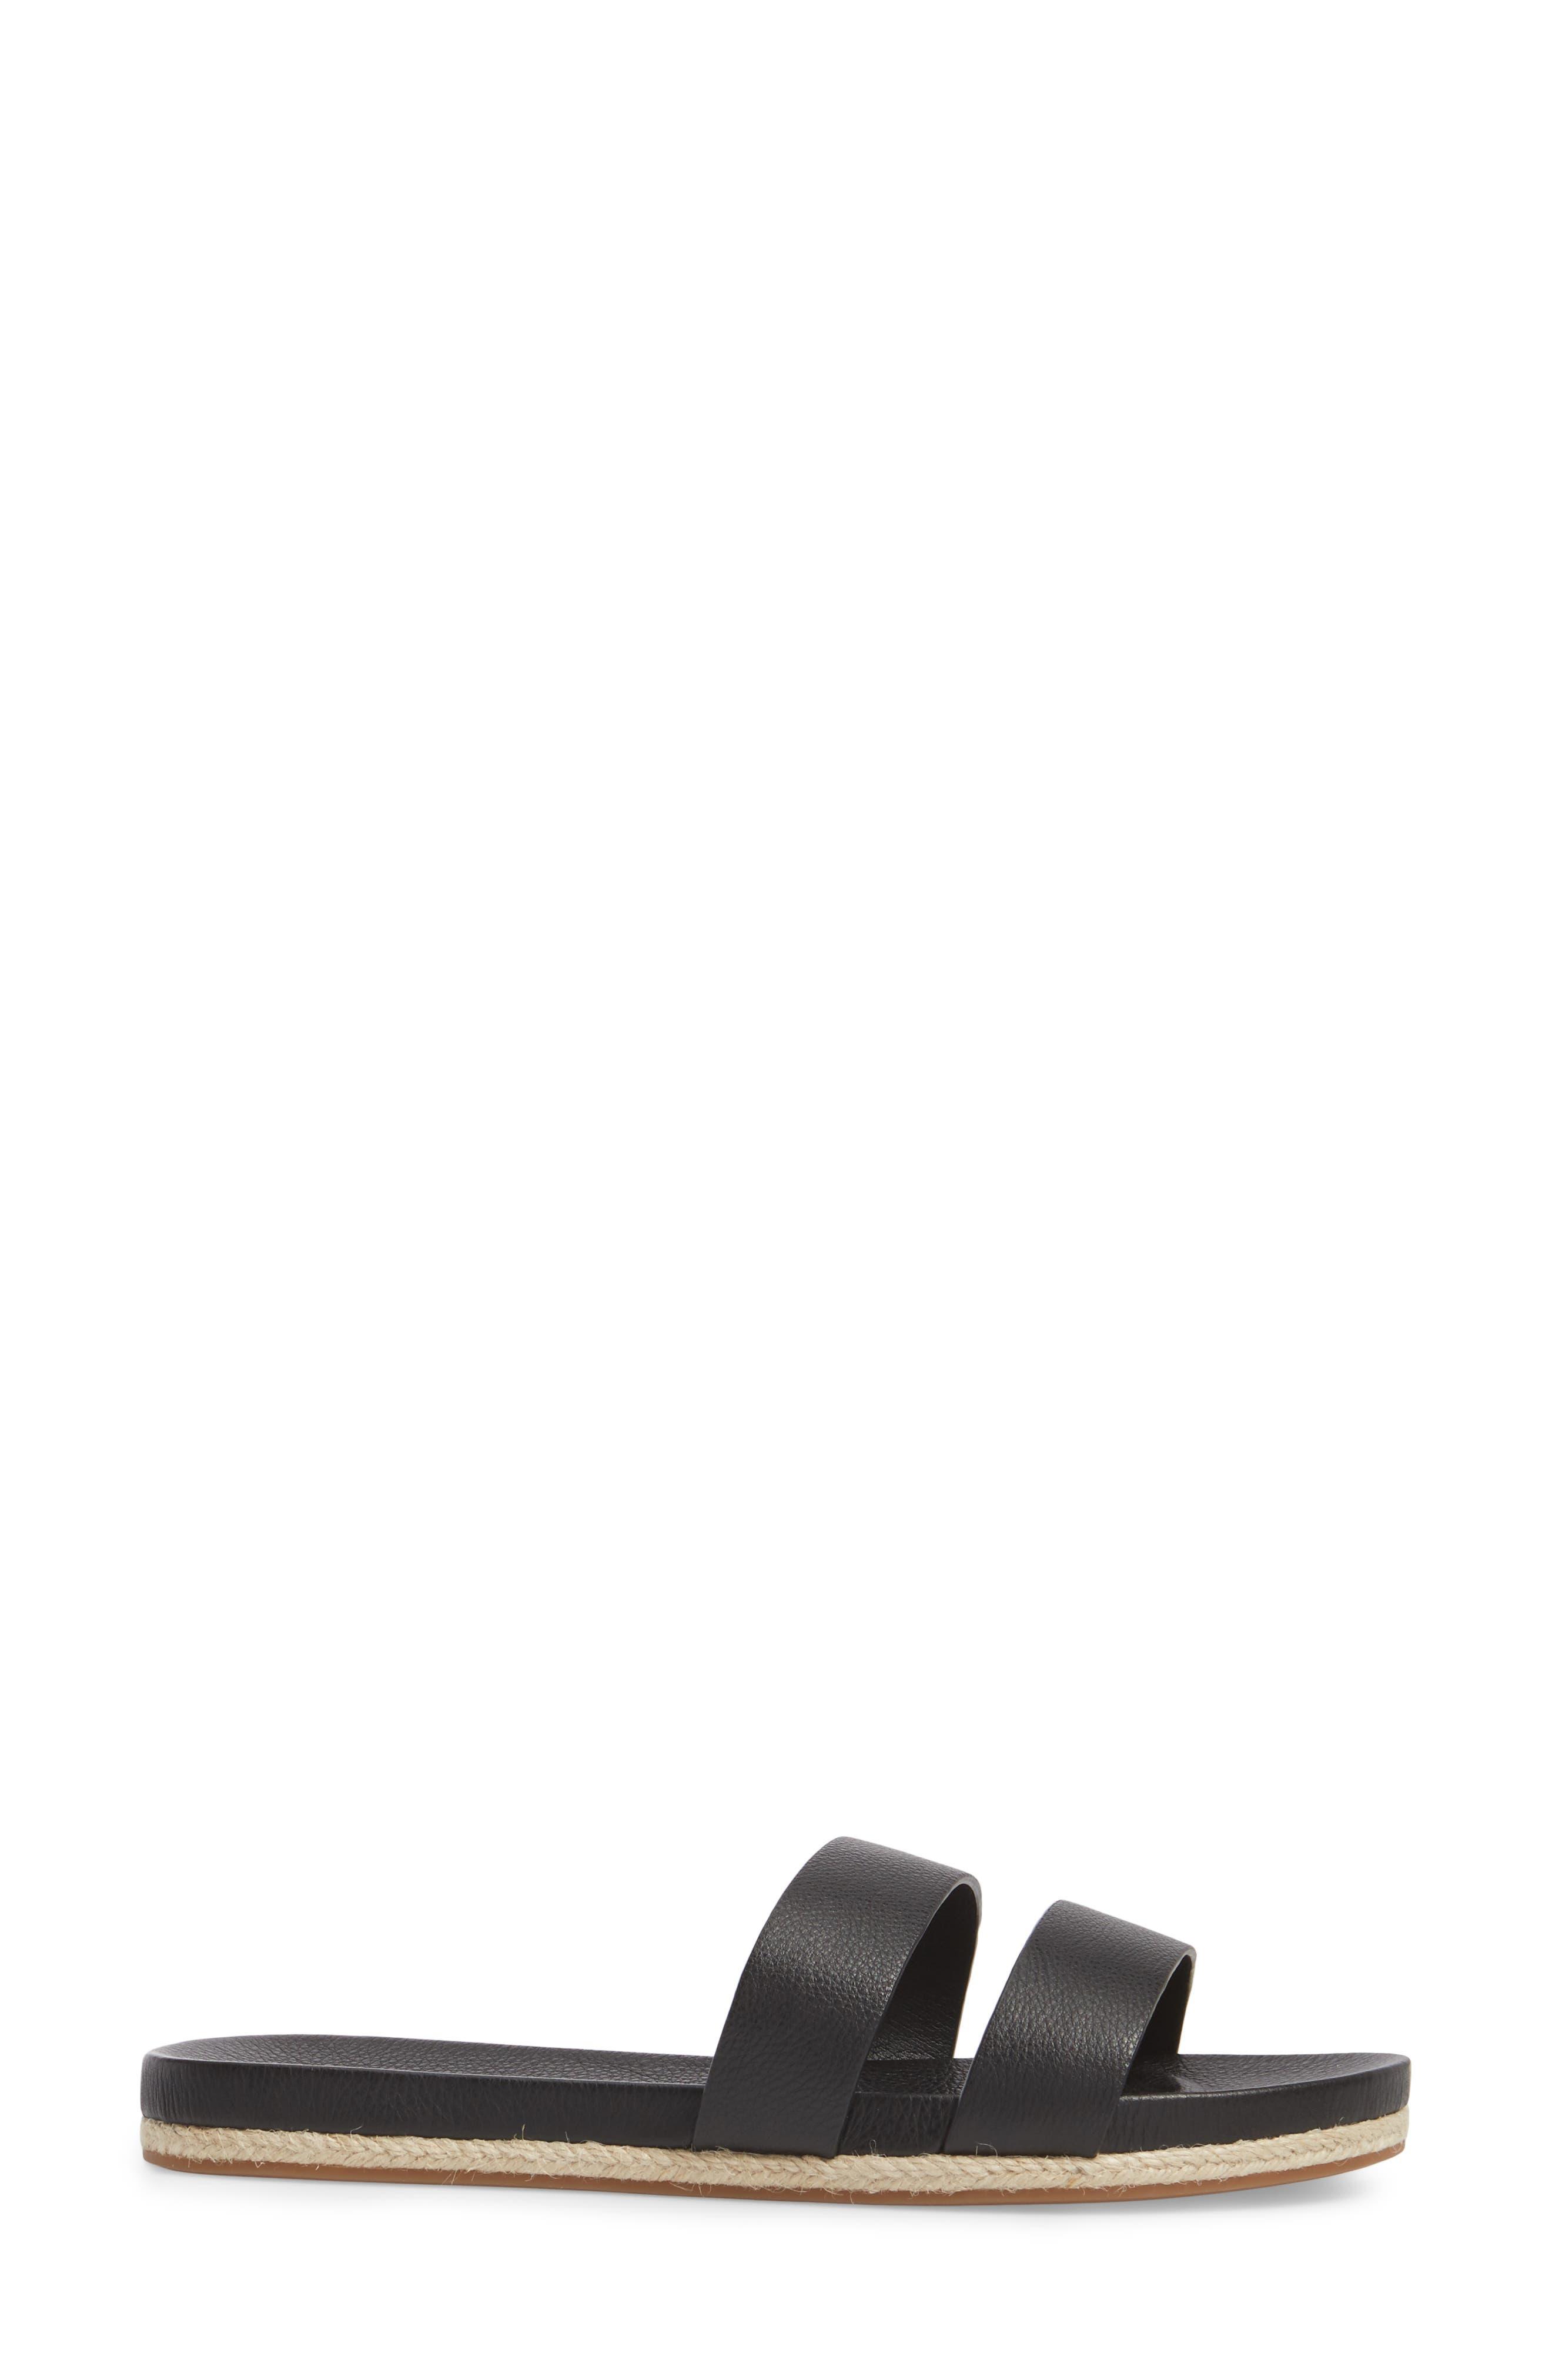 Brittani Slide Sandal,                             Alternate thumbnail 3, color,                             002